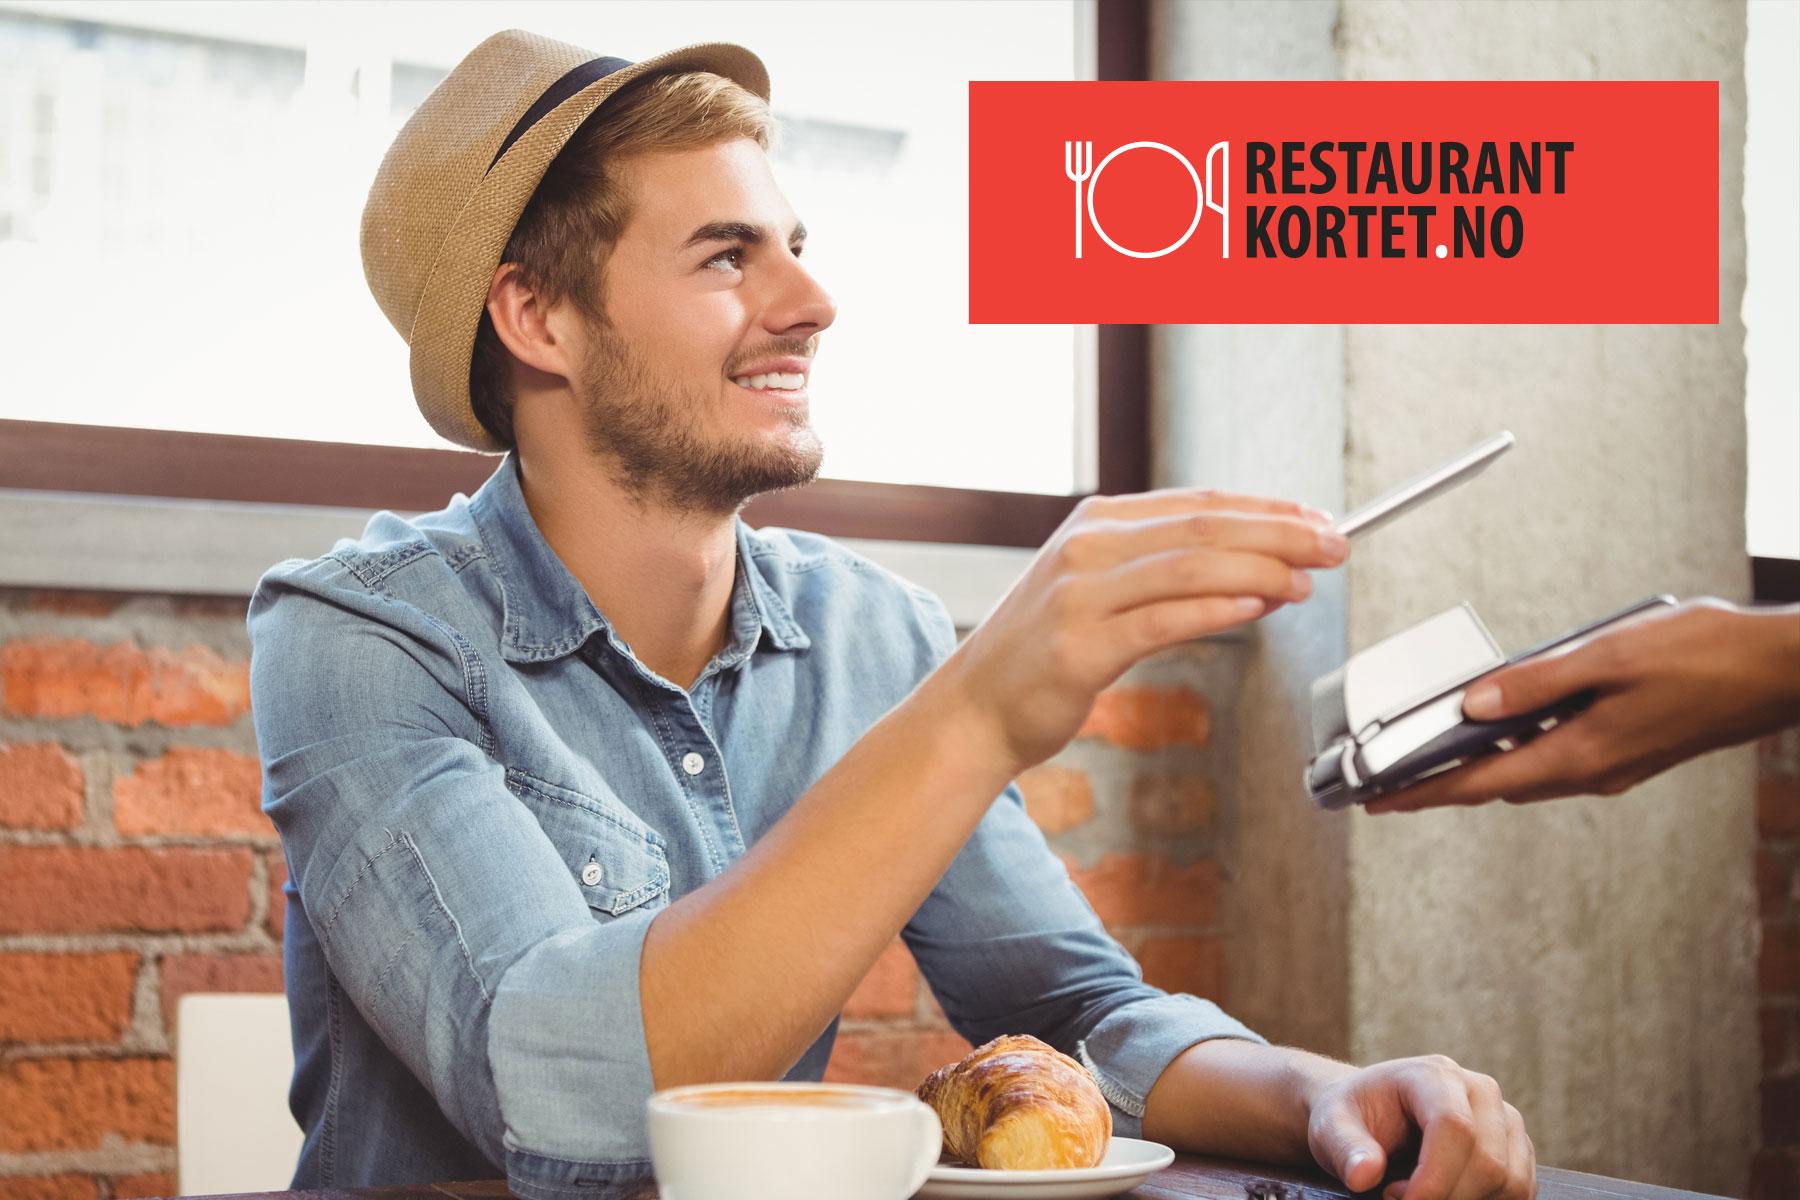 restaurantkortet_logo2